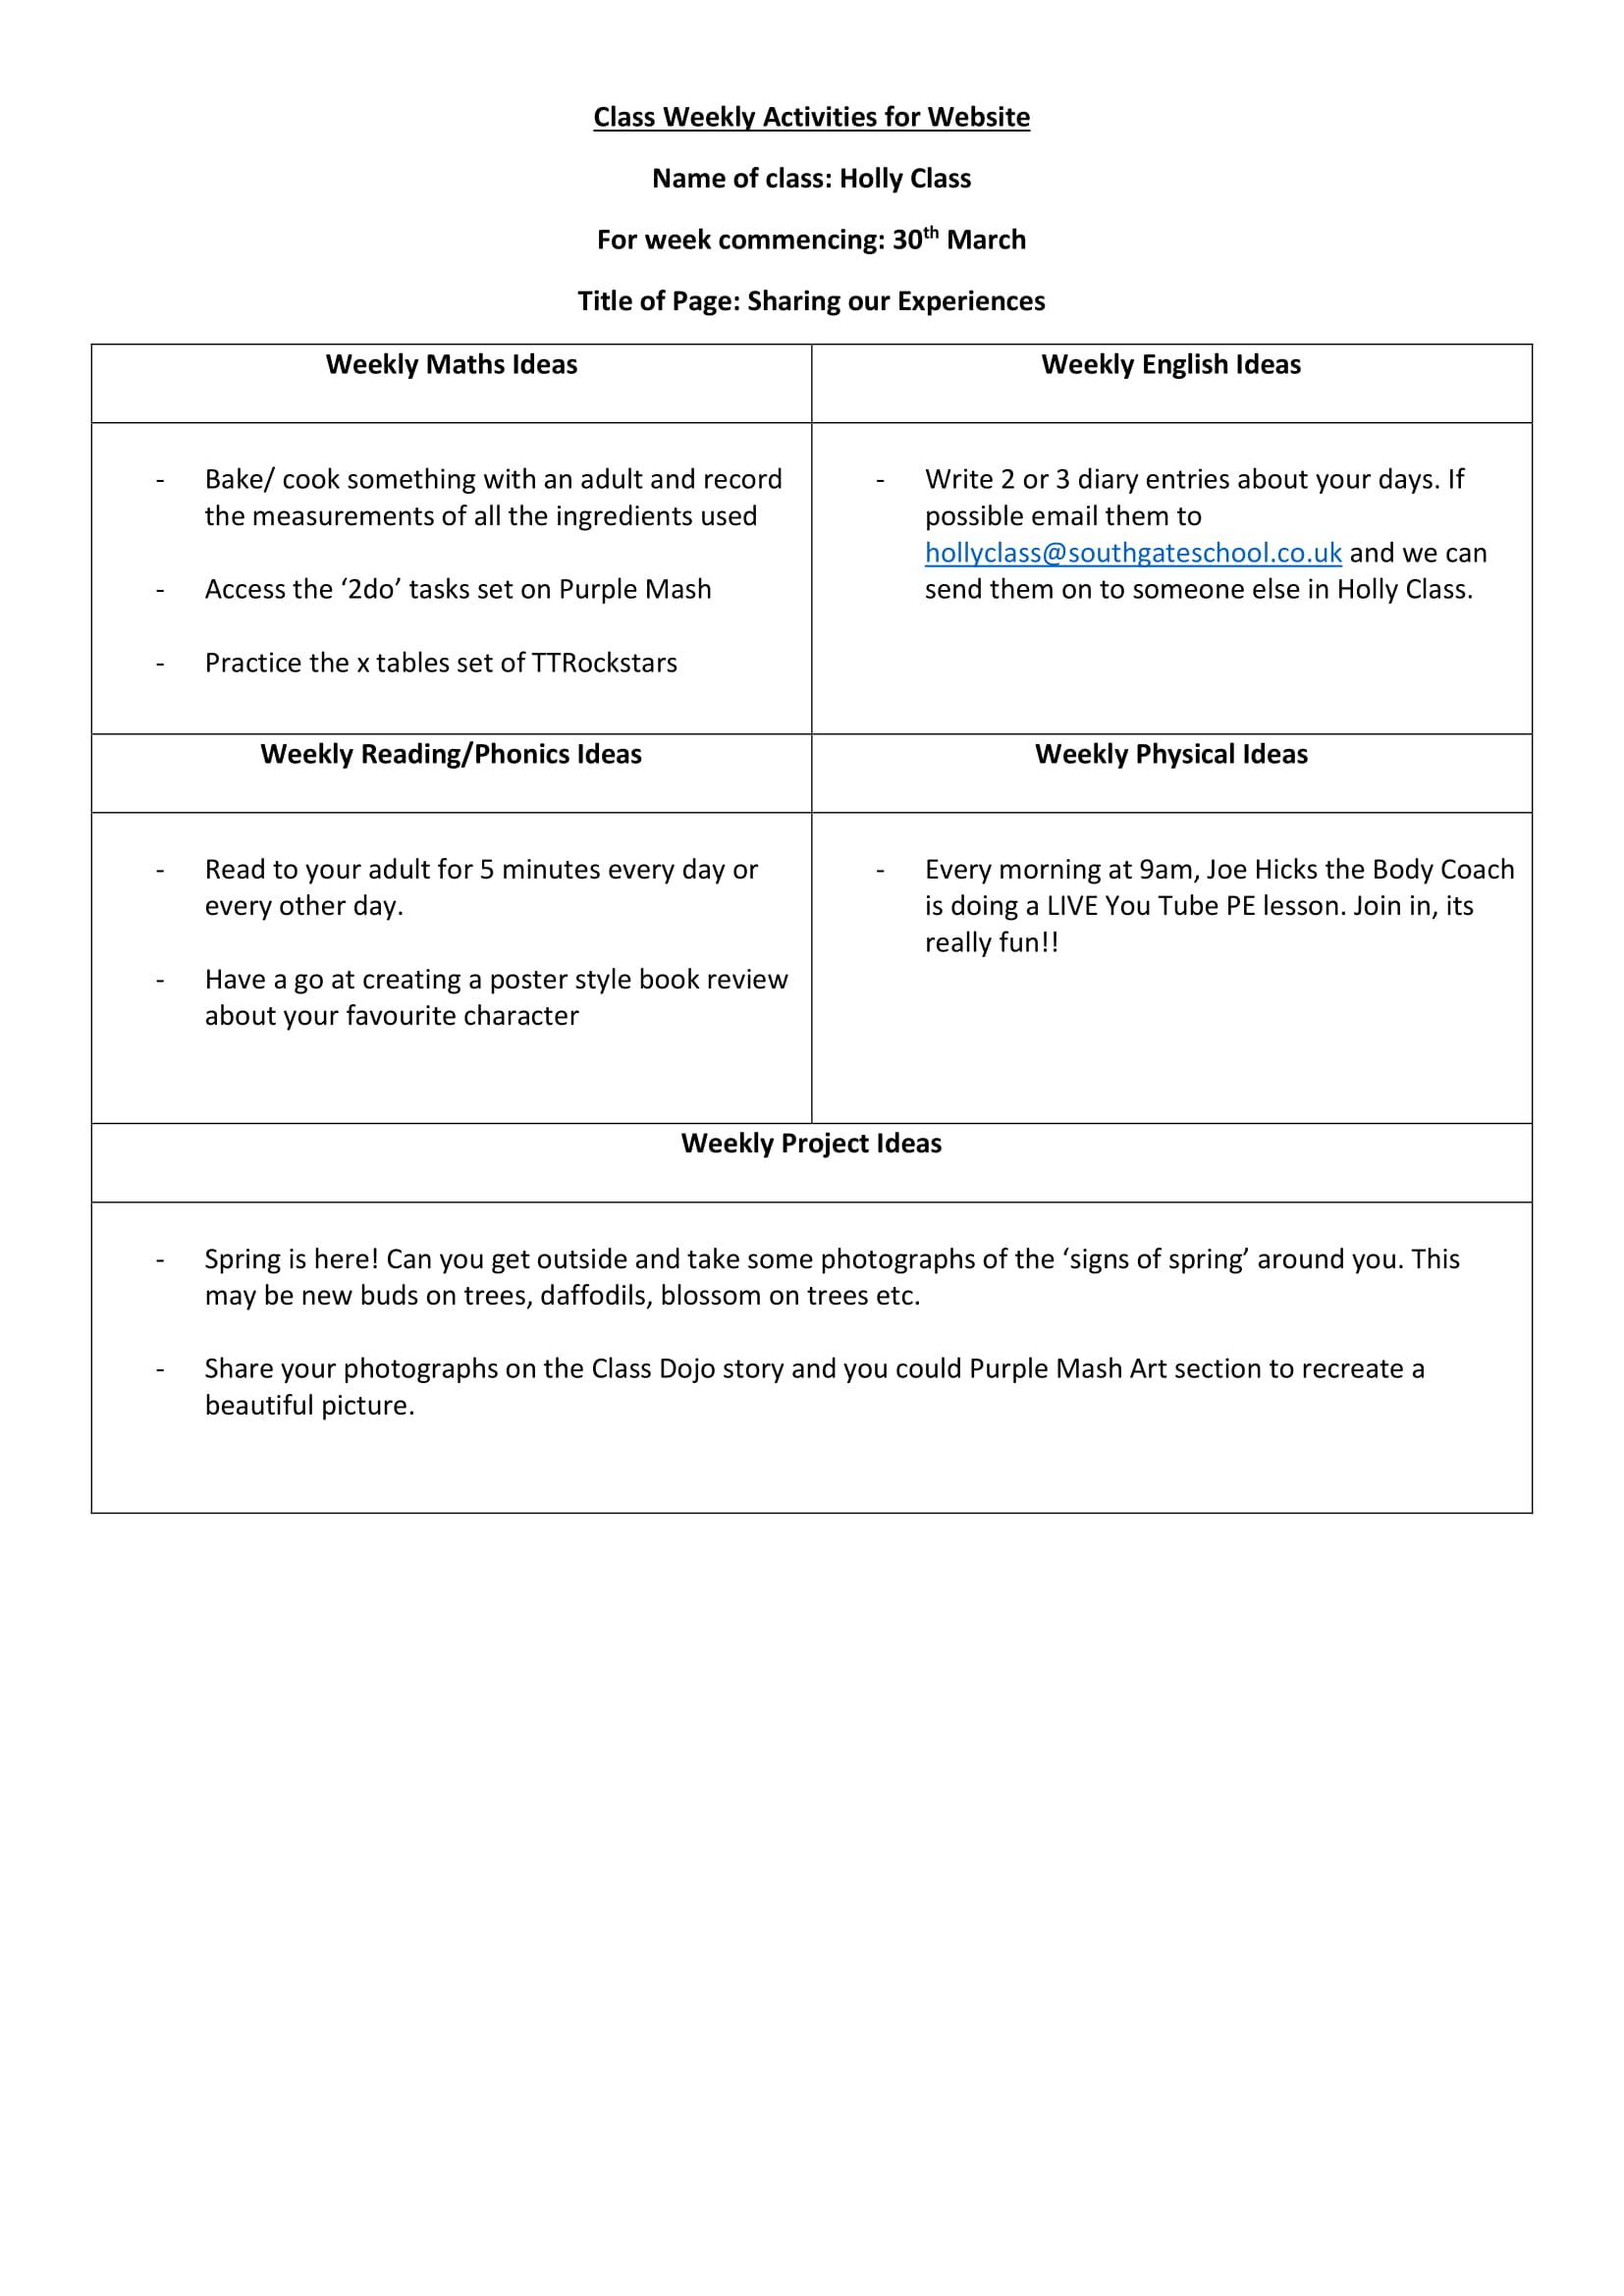 Holly Class Worksheet Week 1-1